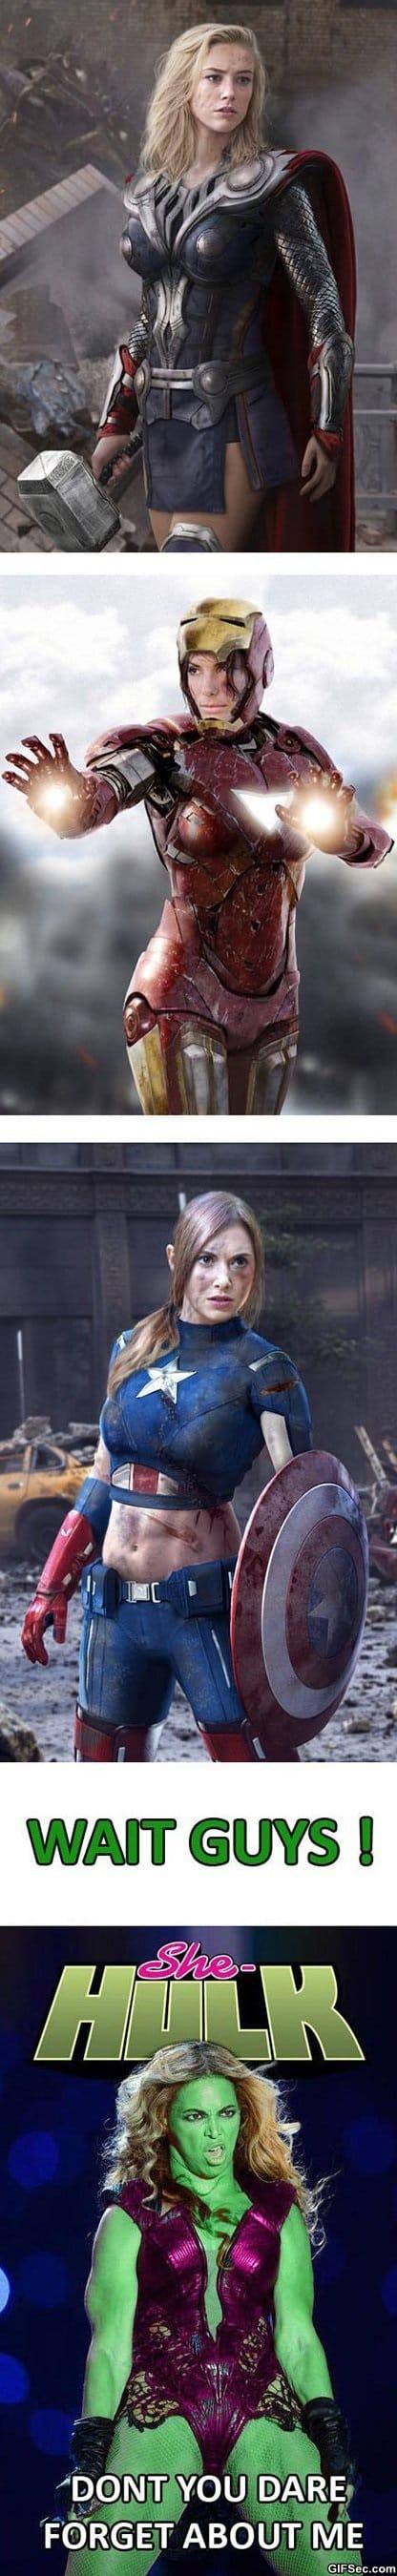 funny-girls-as-superheroes